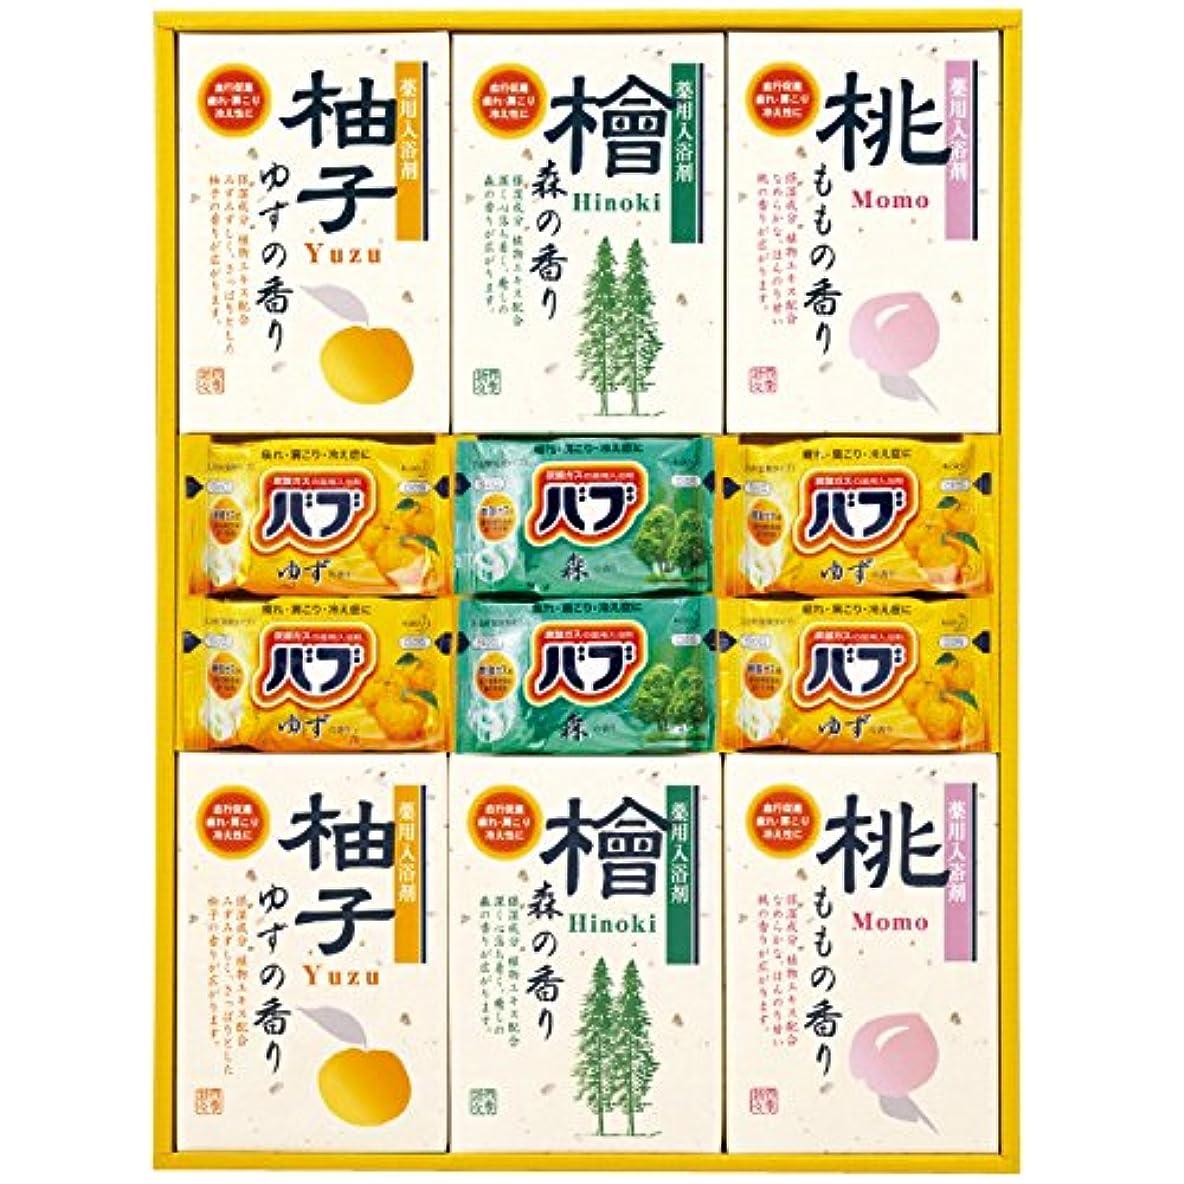 四季折々 薬用入浴剤セット SB-30 7163-050